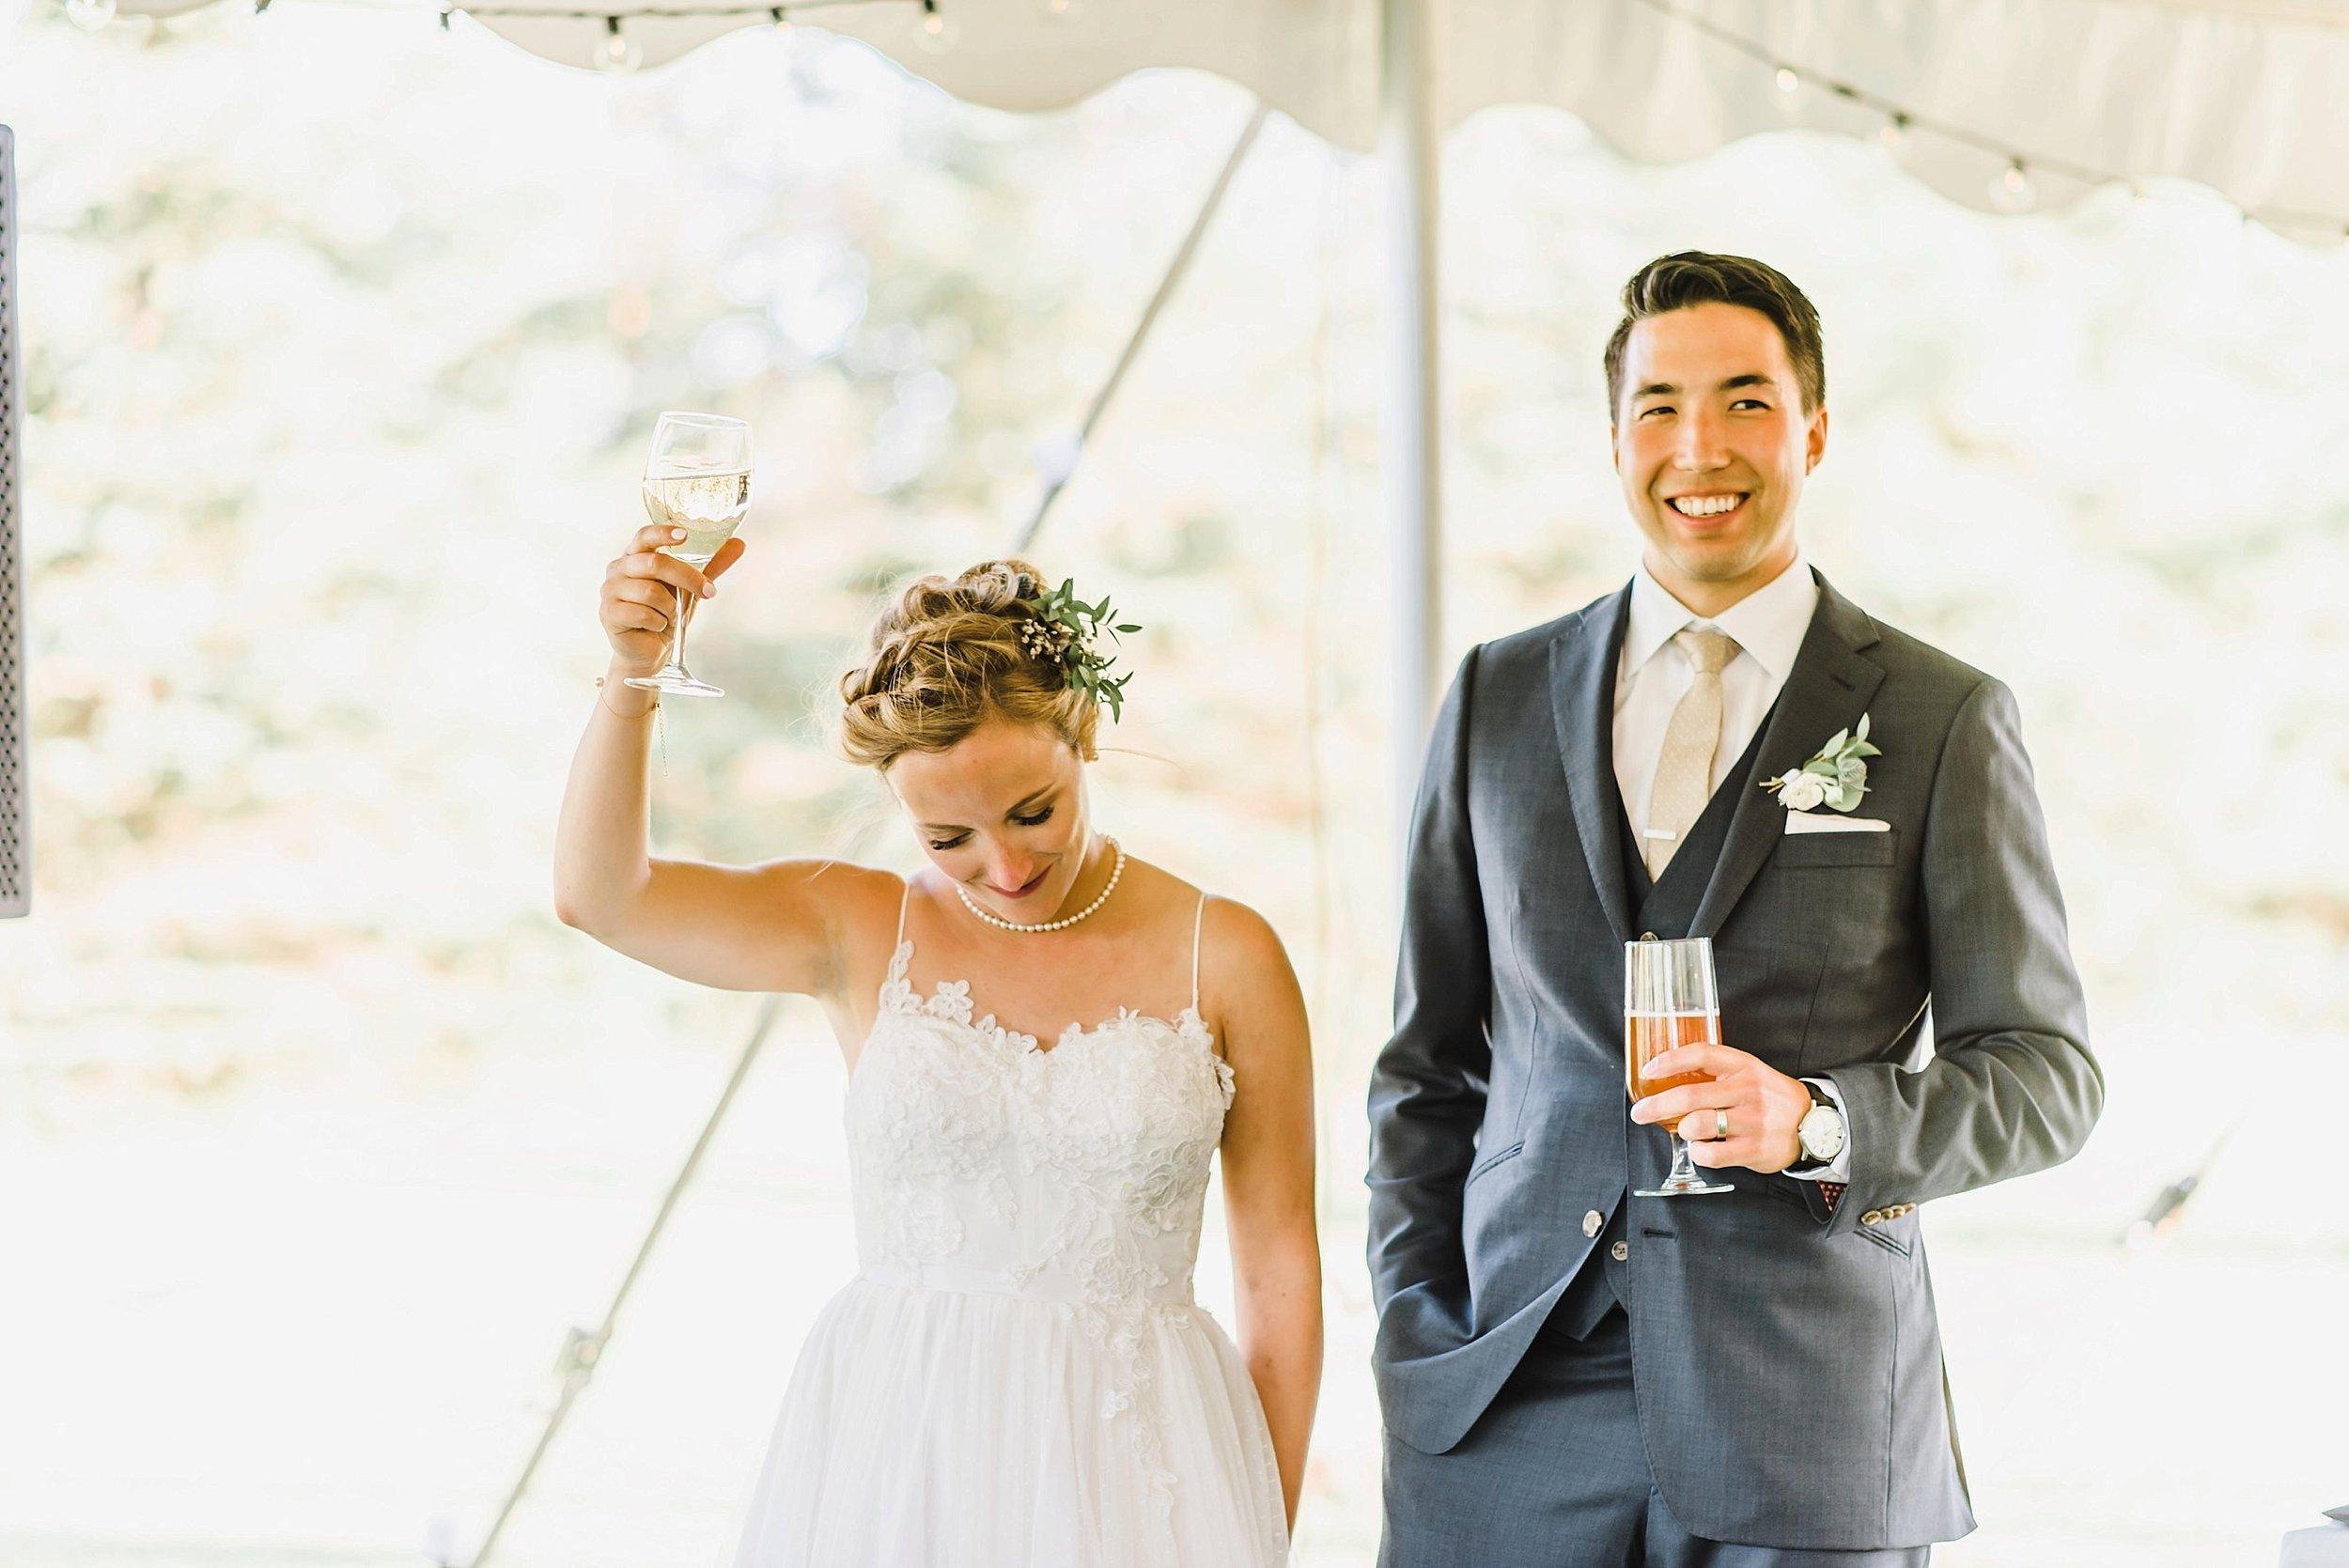 light airy indie fine art ottawa wedding photographer | Ali and Batoul Photography_0884.jpg